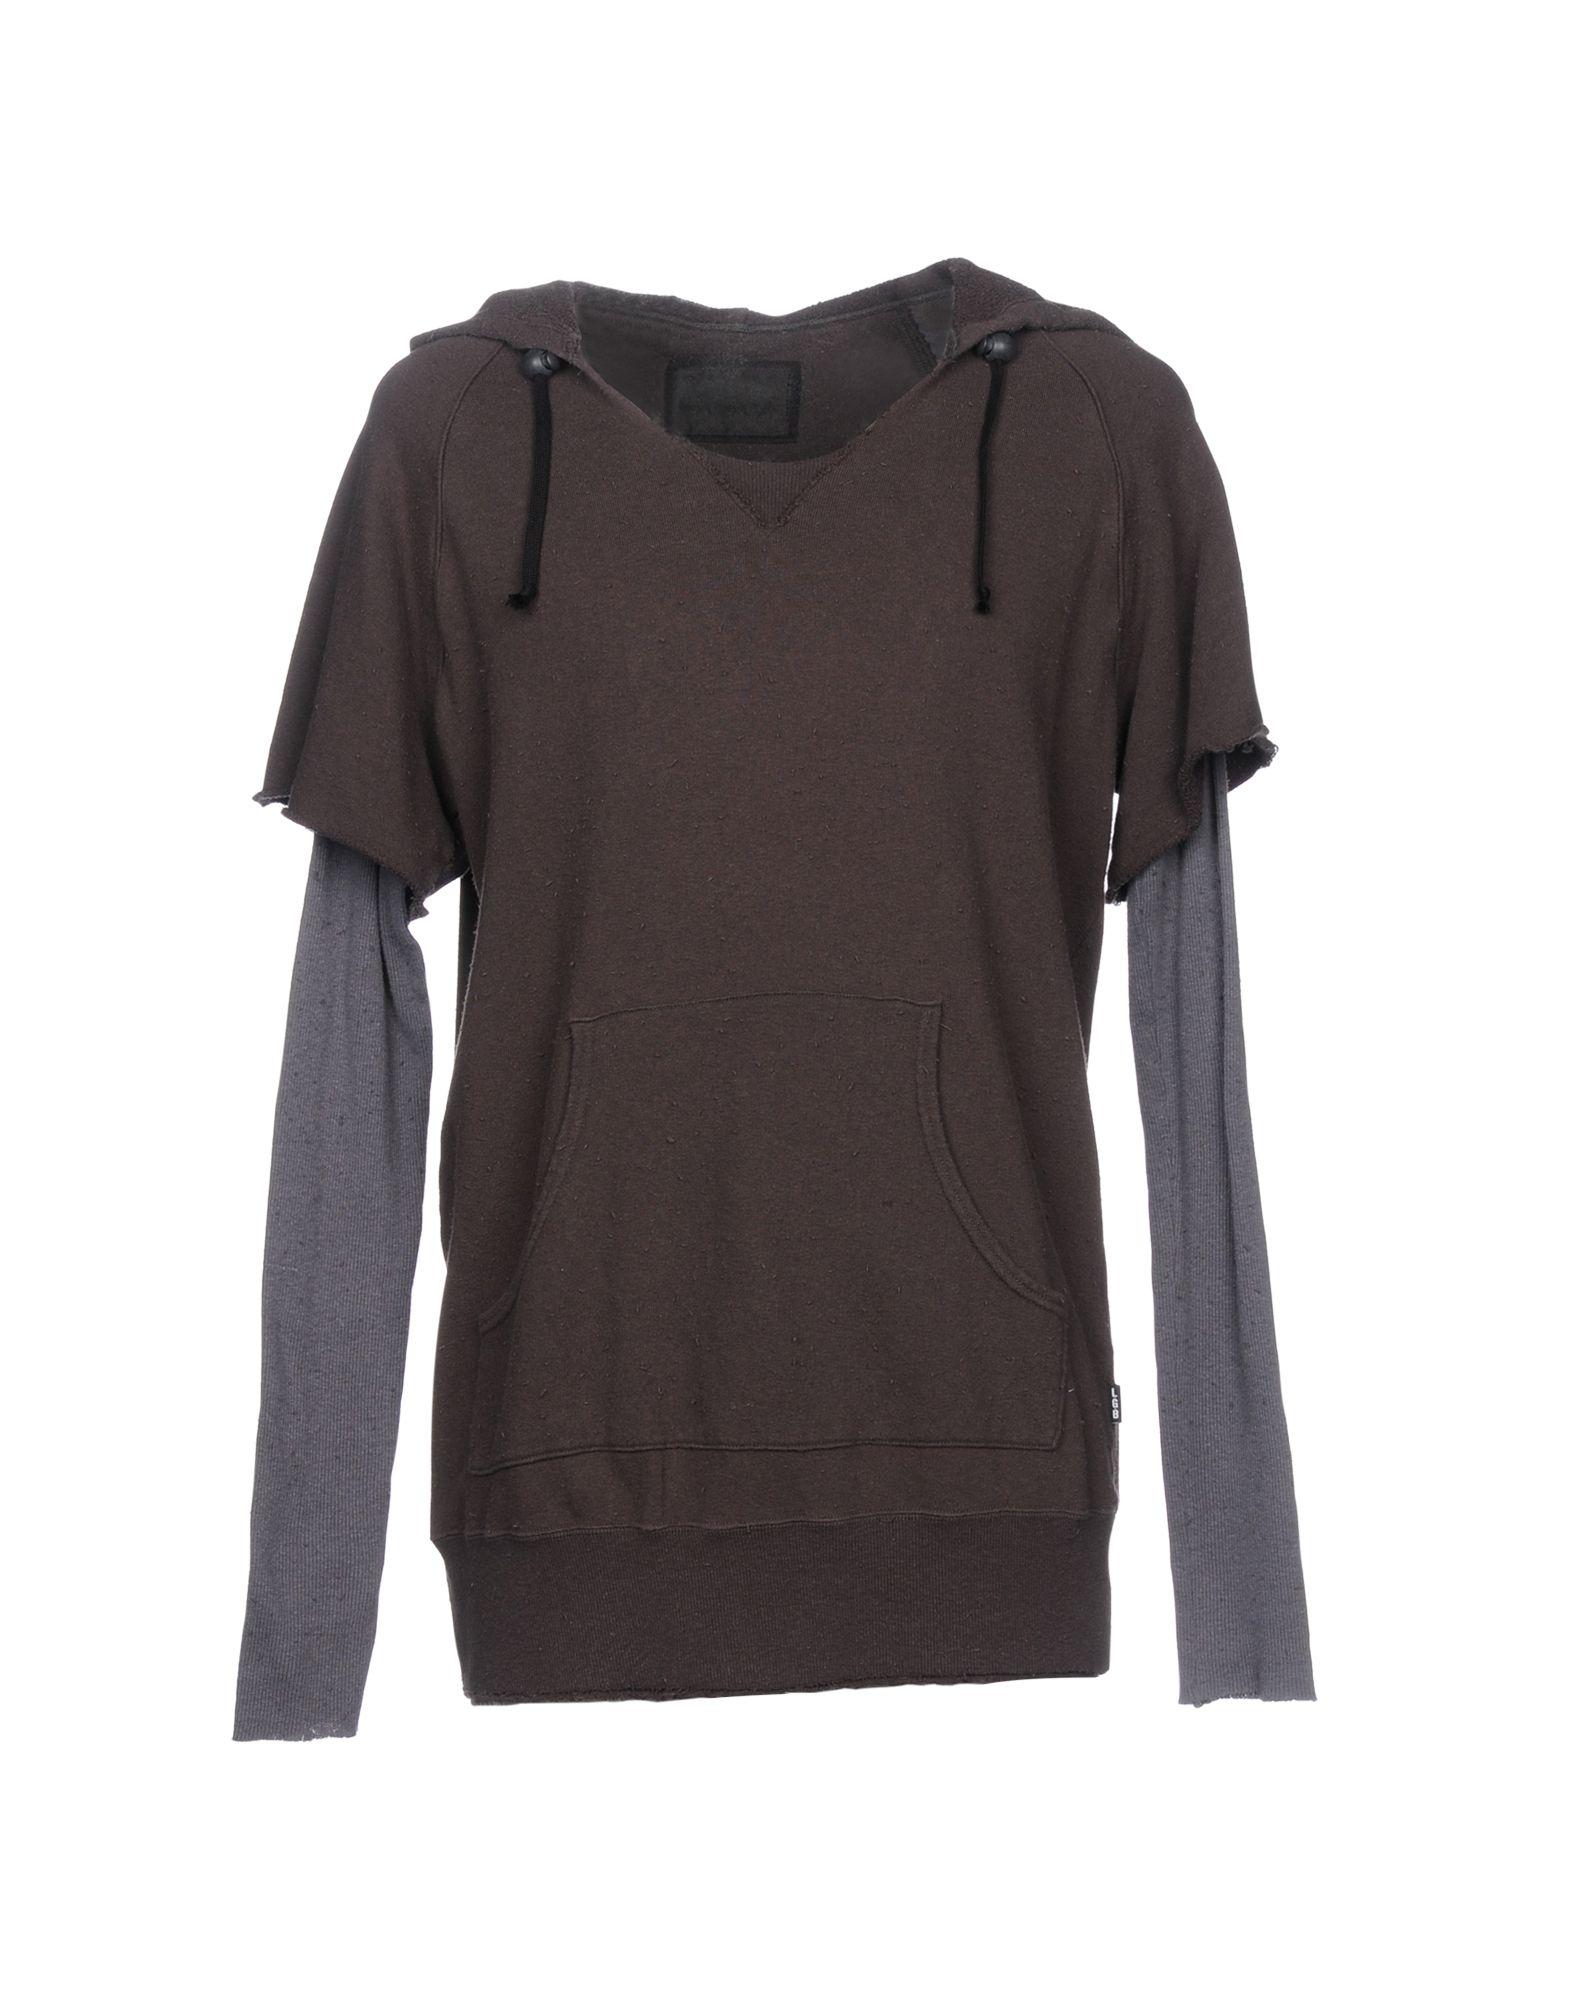 L.G.B. Hooded Sweatshirt in Dark Green